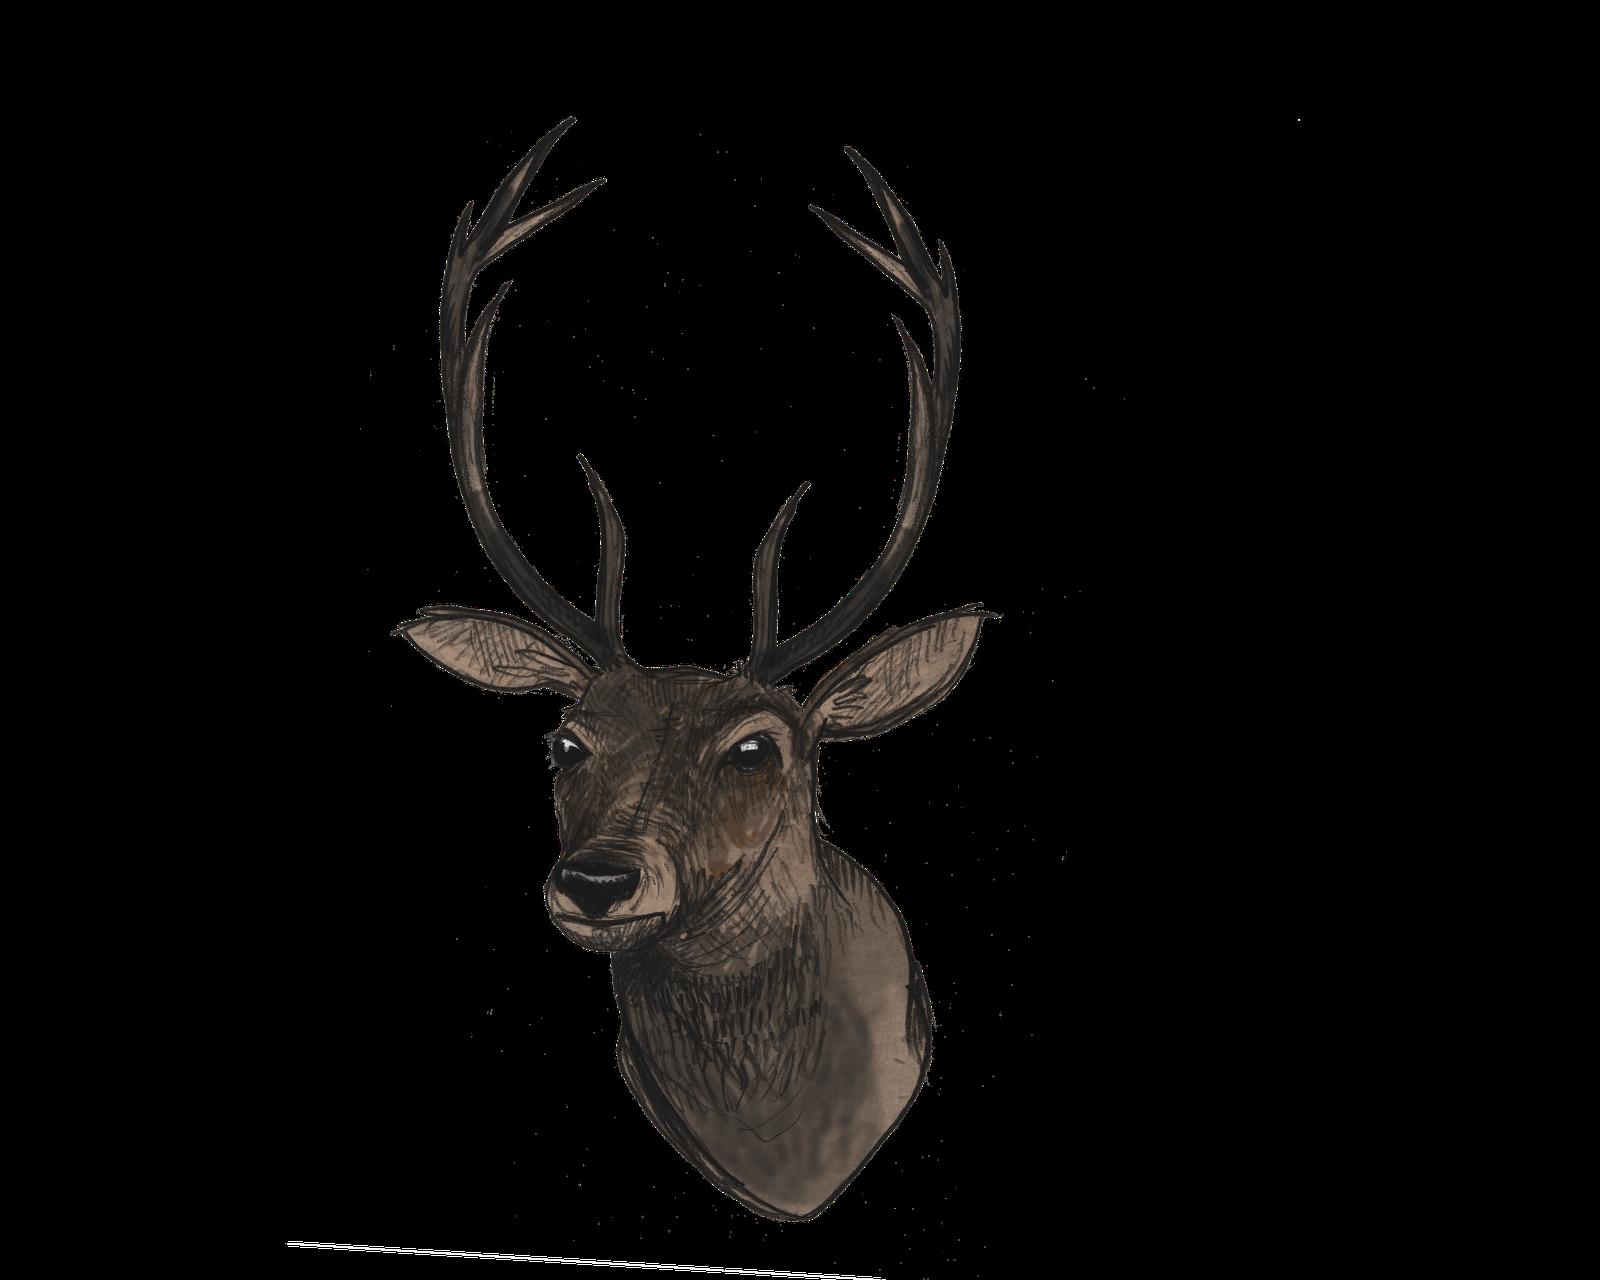 Deer Illustrations - Cliparts.co